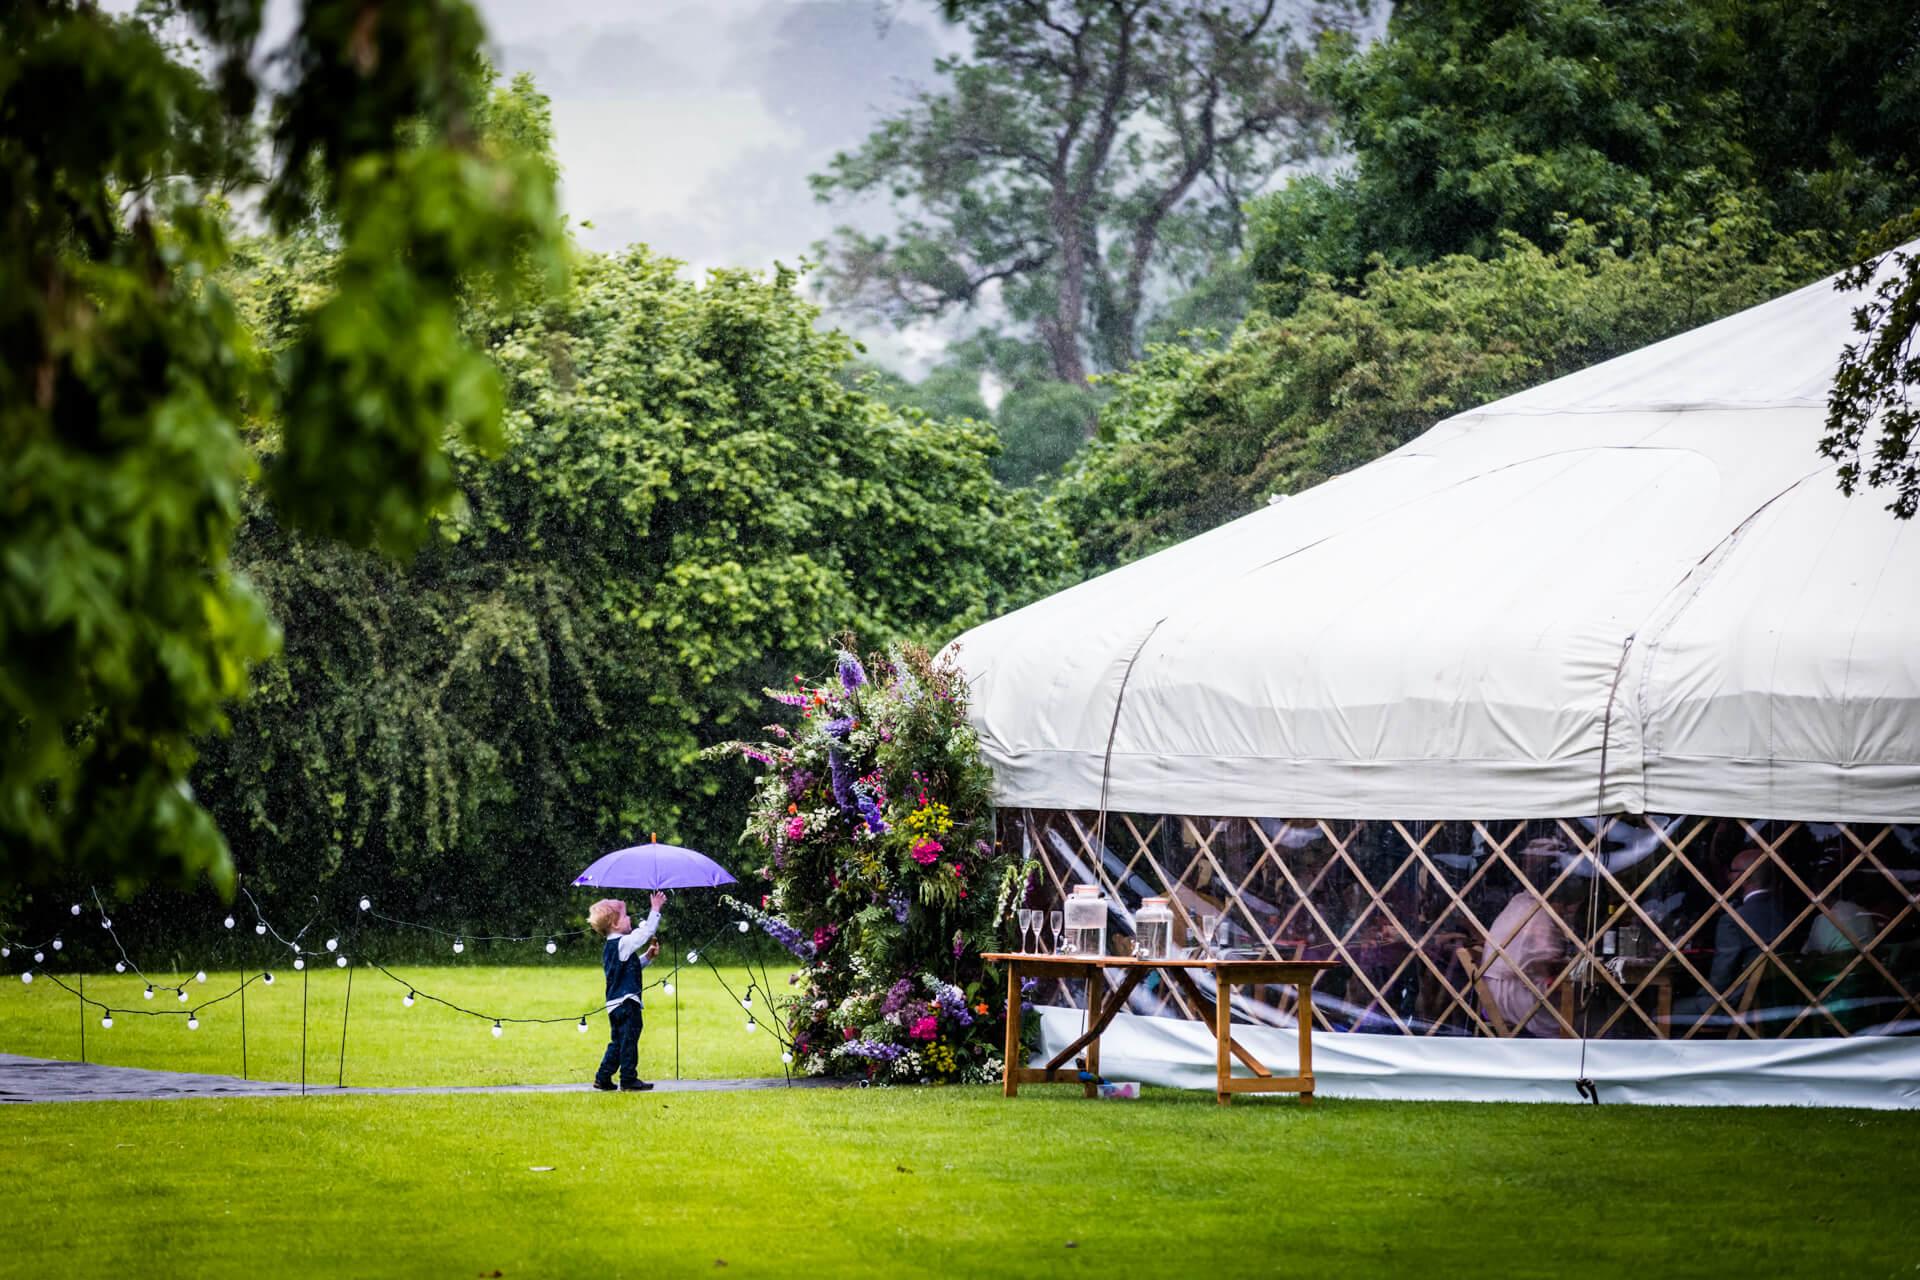 a pageboy holding an umbrella up outside a wedding yurt